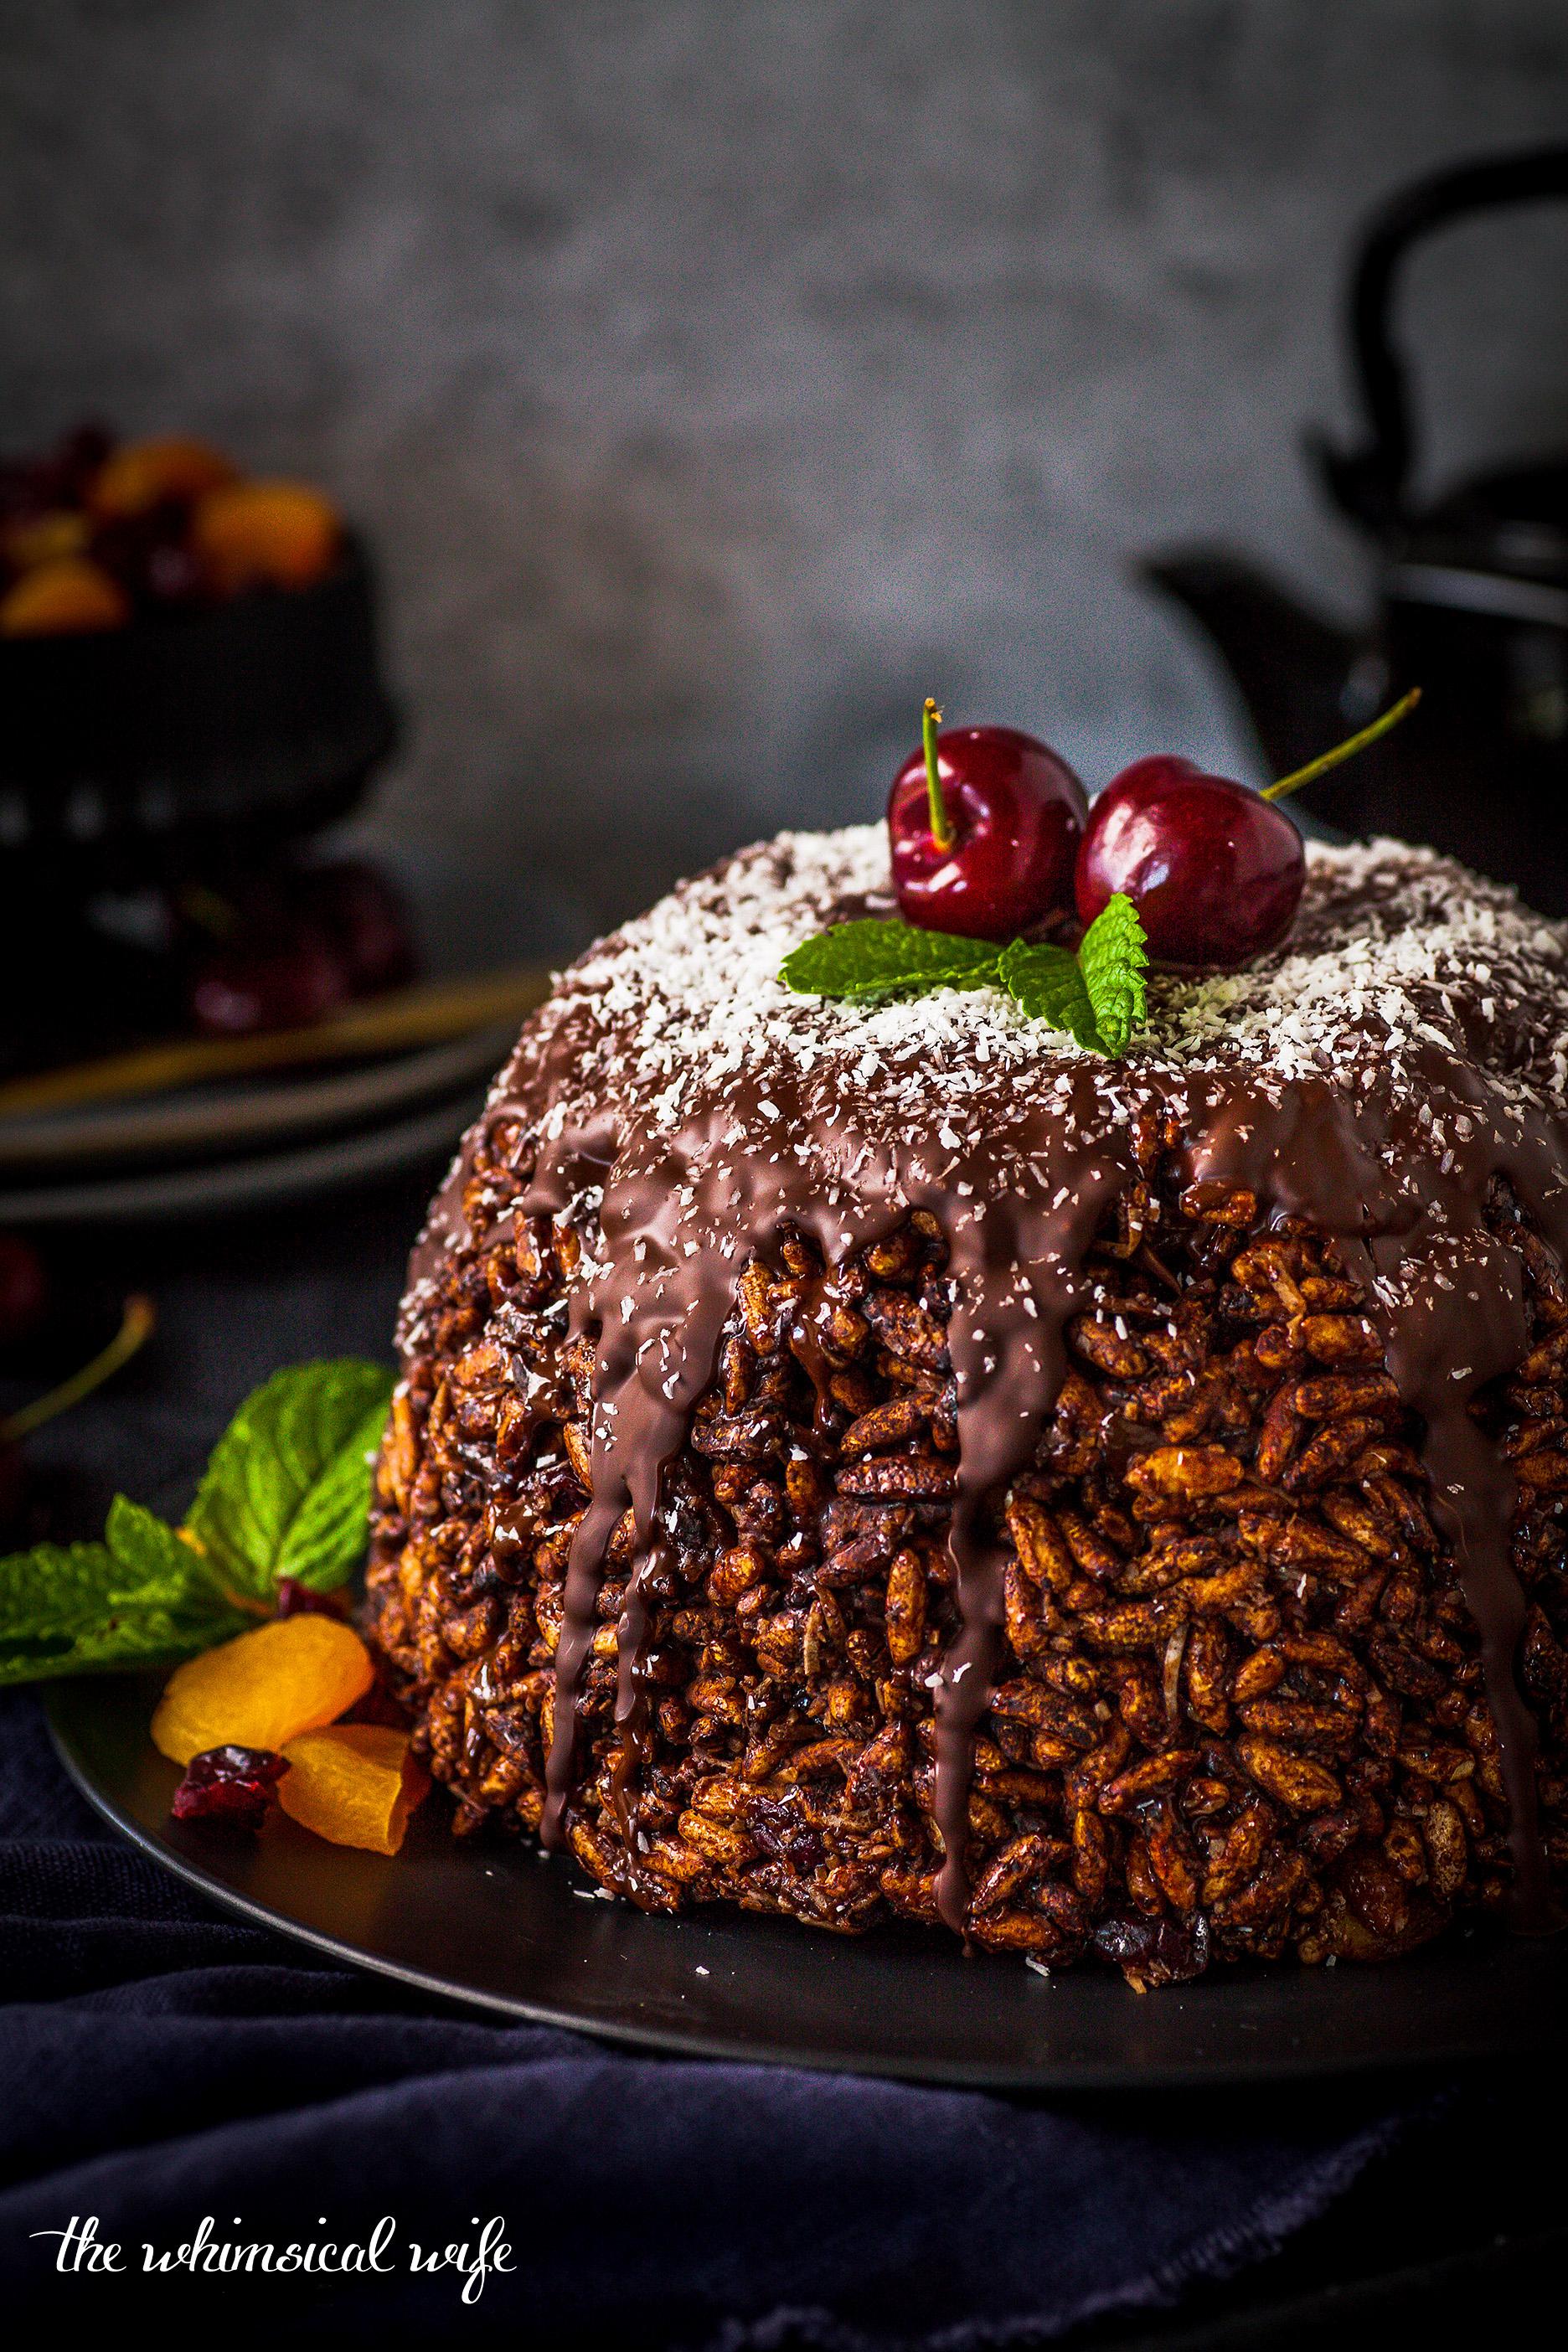 Chocolate Rice Crispy Christmas Pudding (GF, DF, Nut & Egg Free)